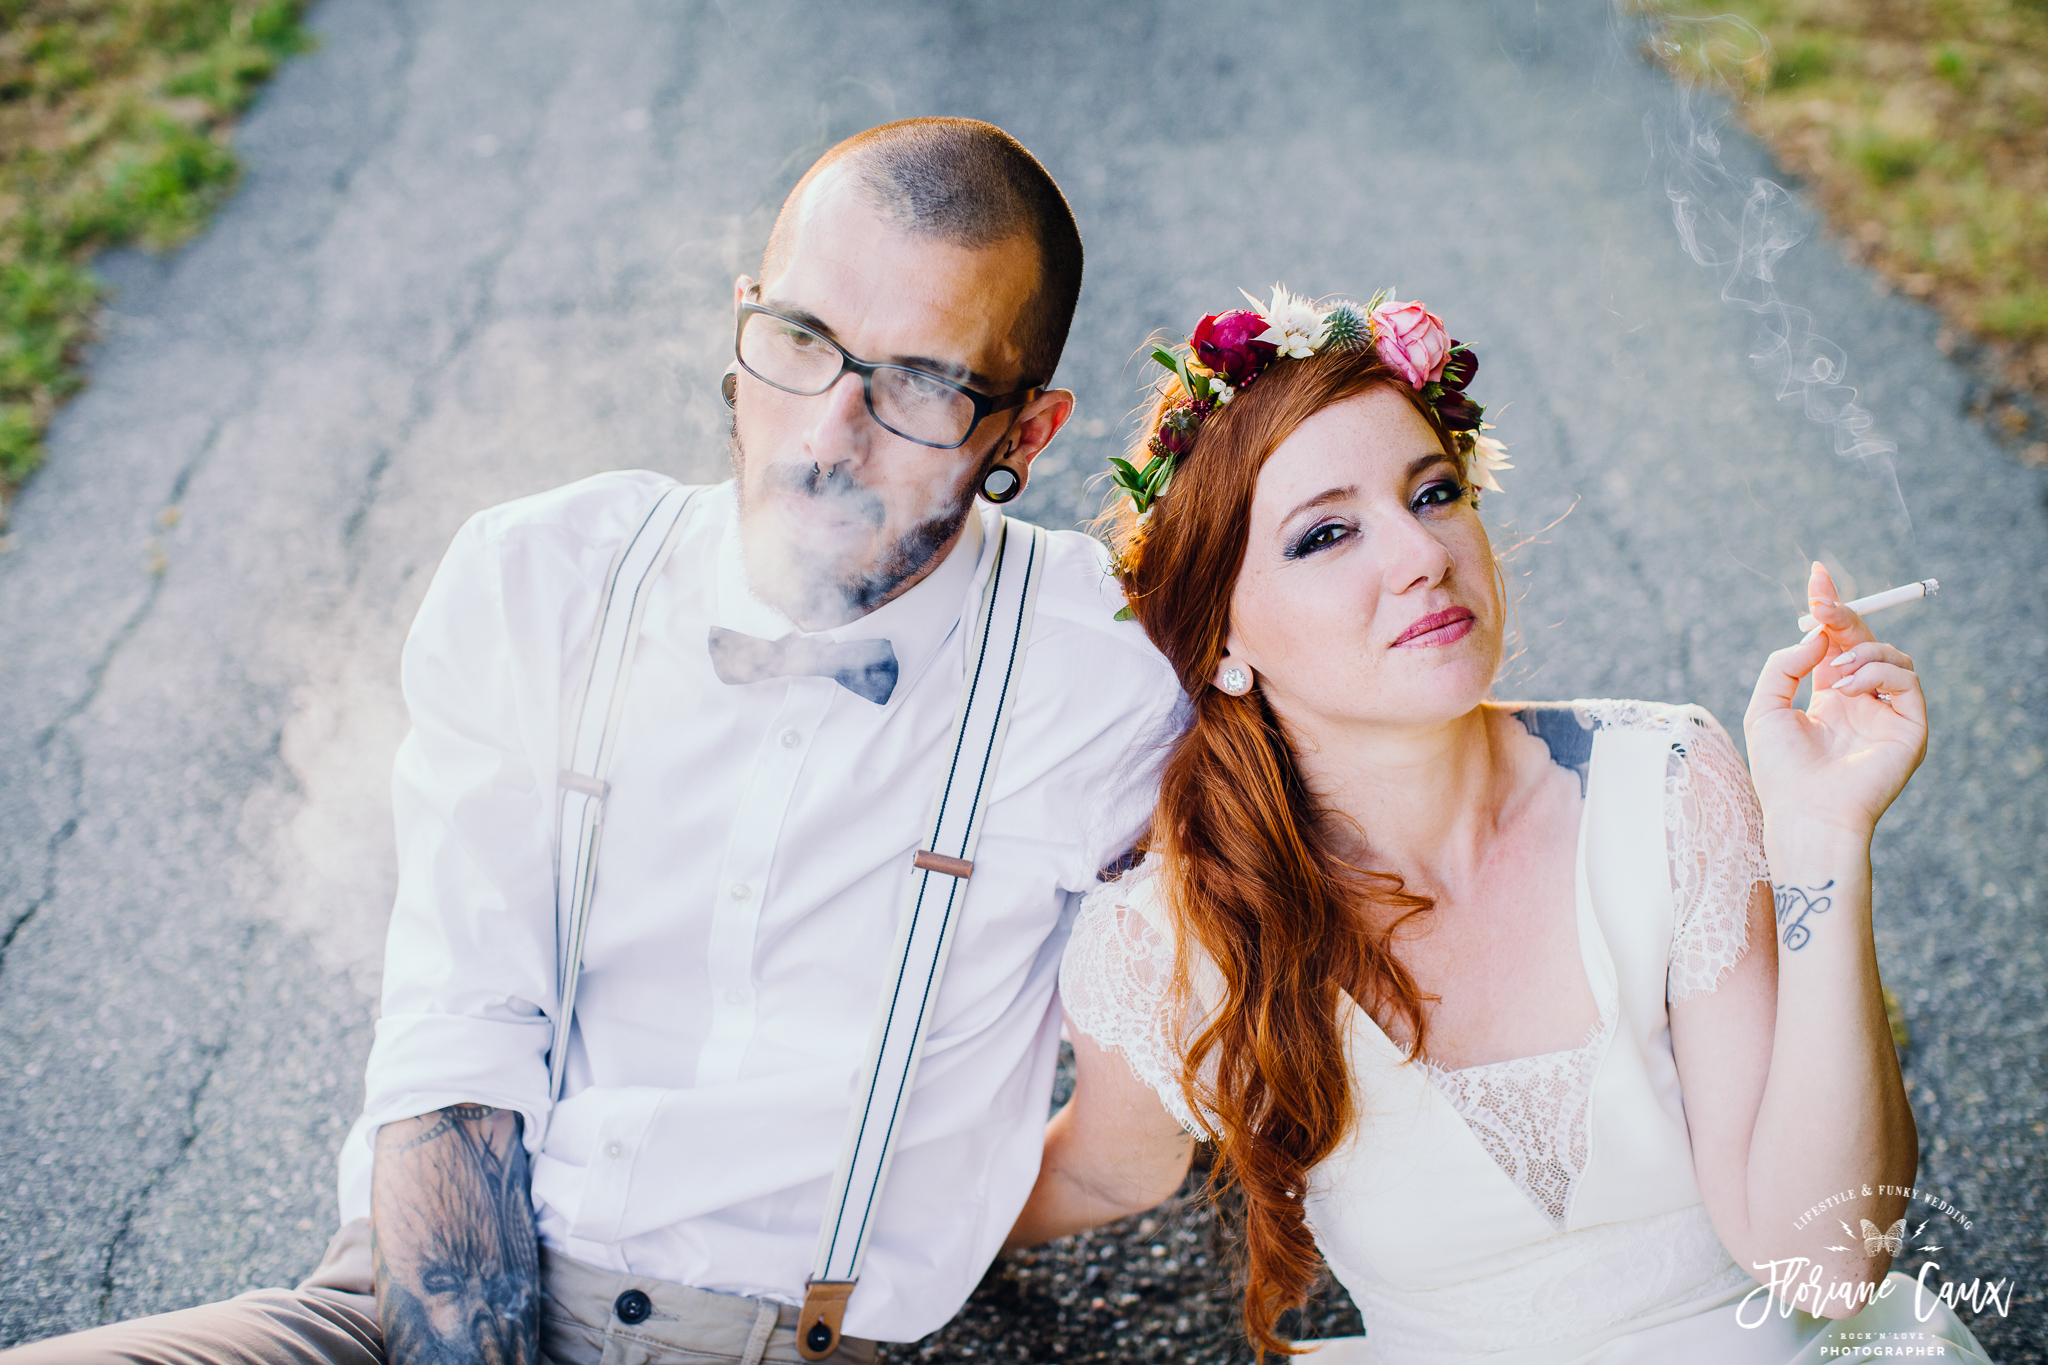 photographe-mariage-toulouse-rocknroll-maries-tatoues-floriane-caux-76